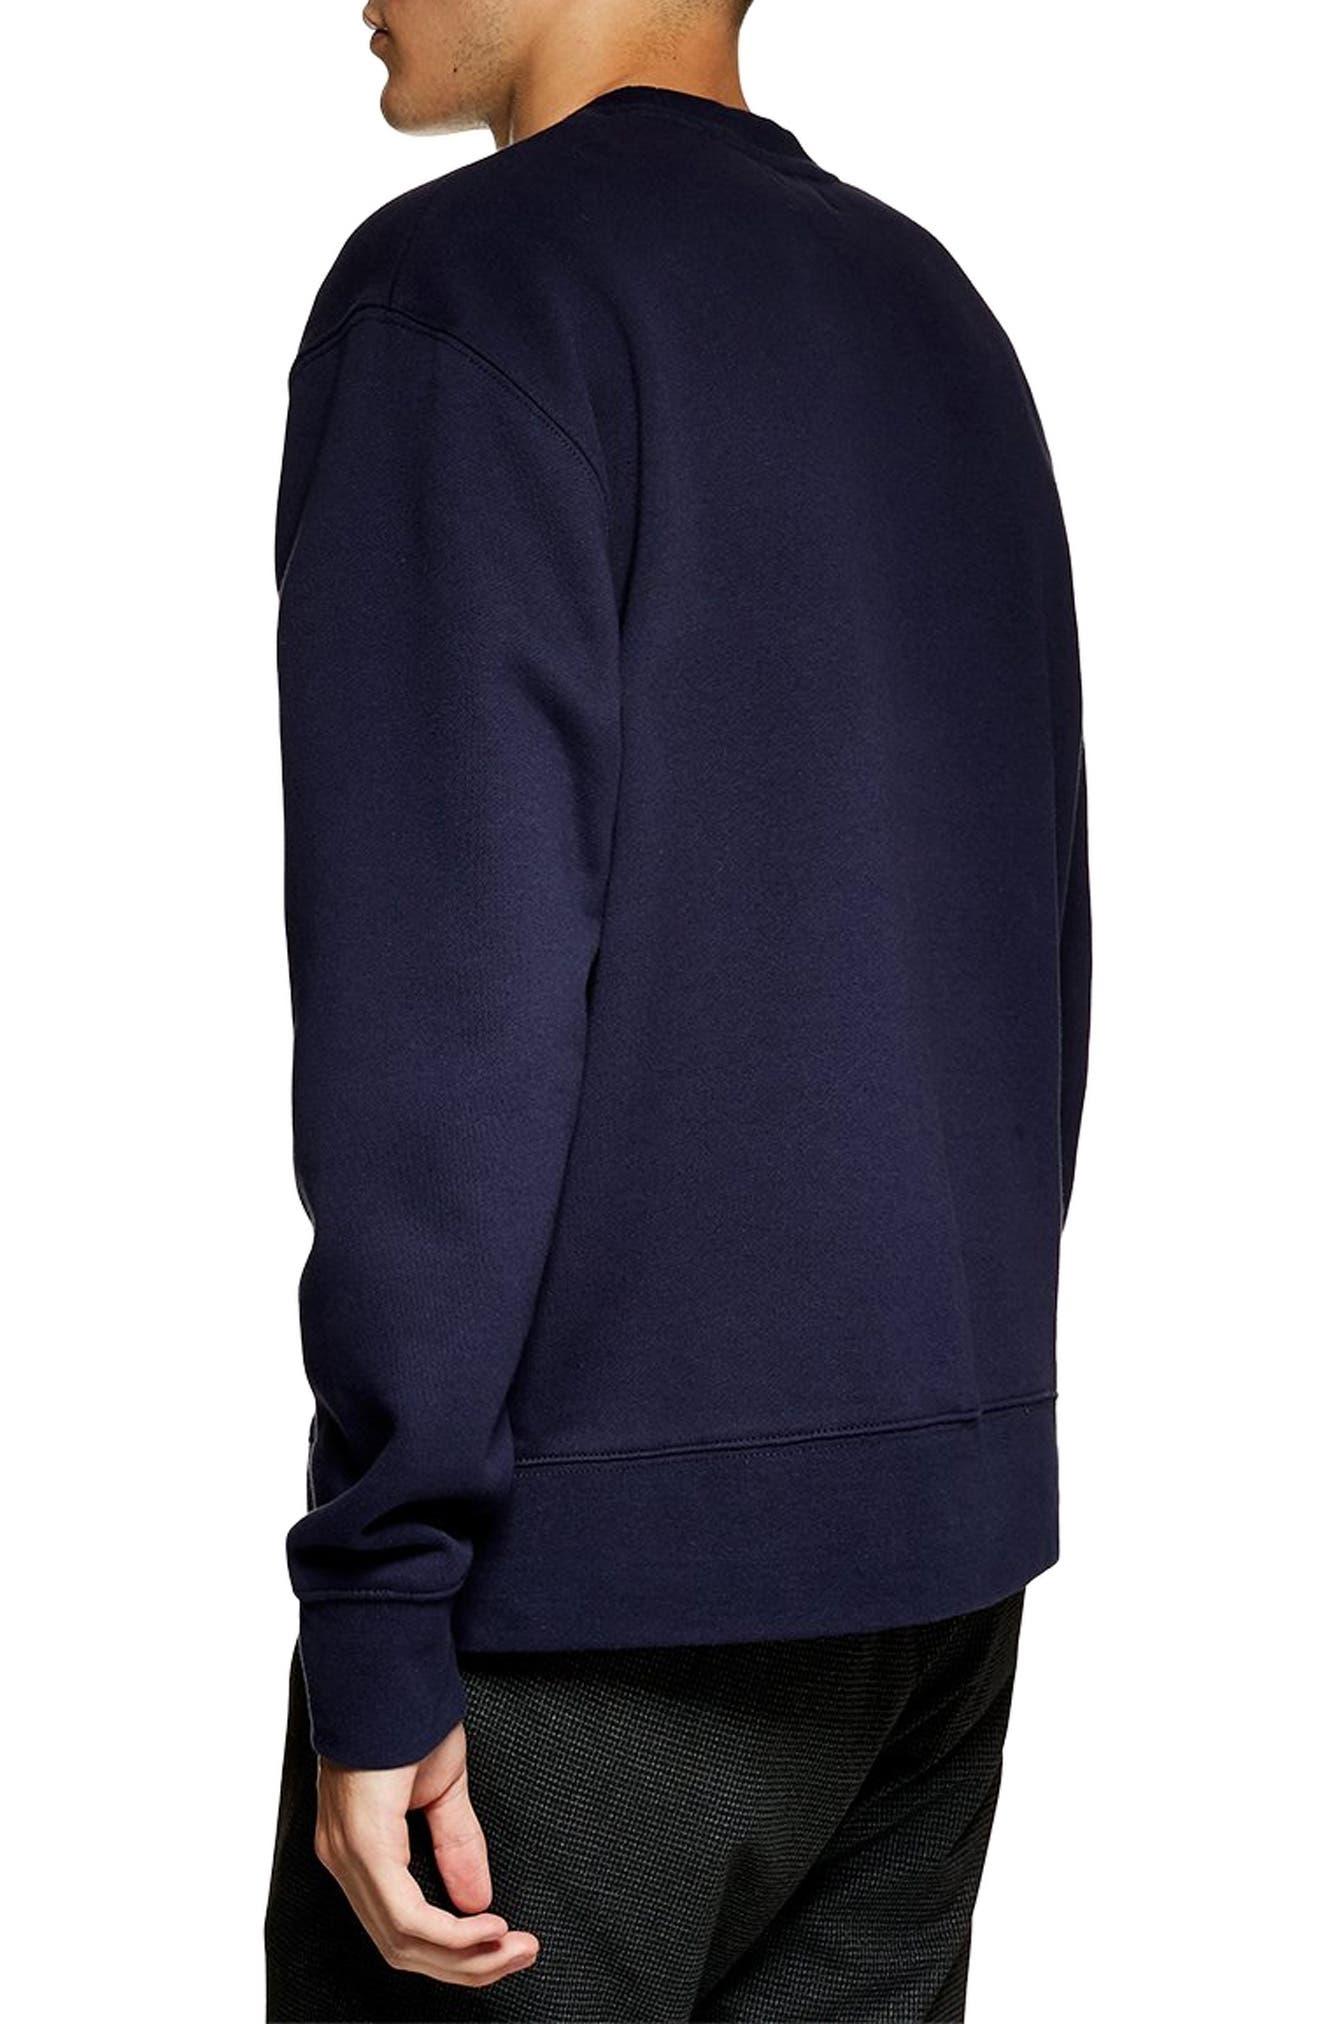 Tristan Sweatshirt,                             Alternate thumbnail 2, color,                             NAVY BLUE